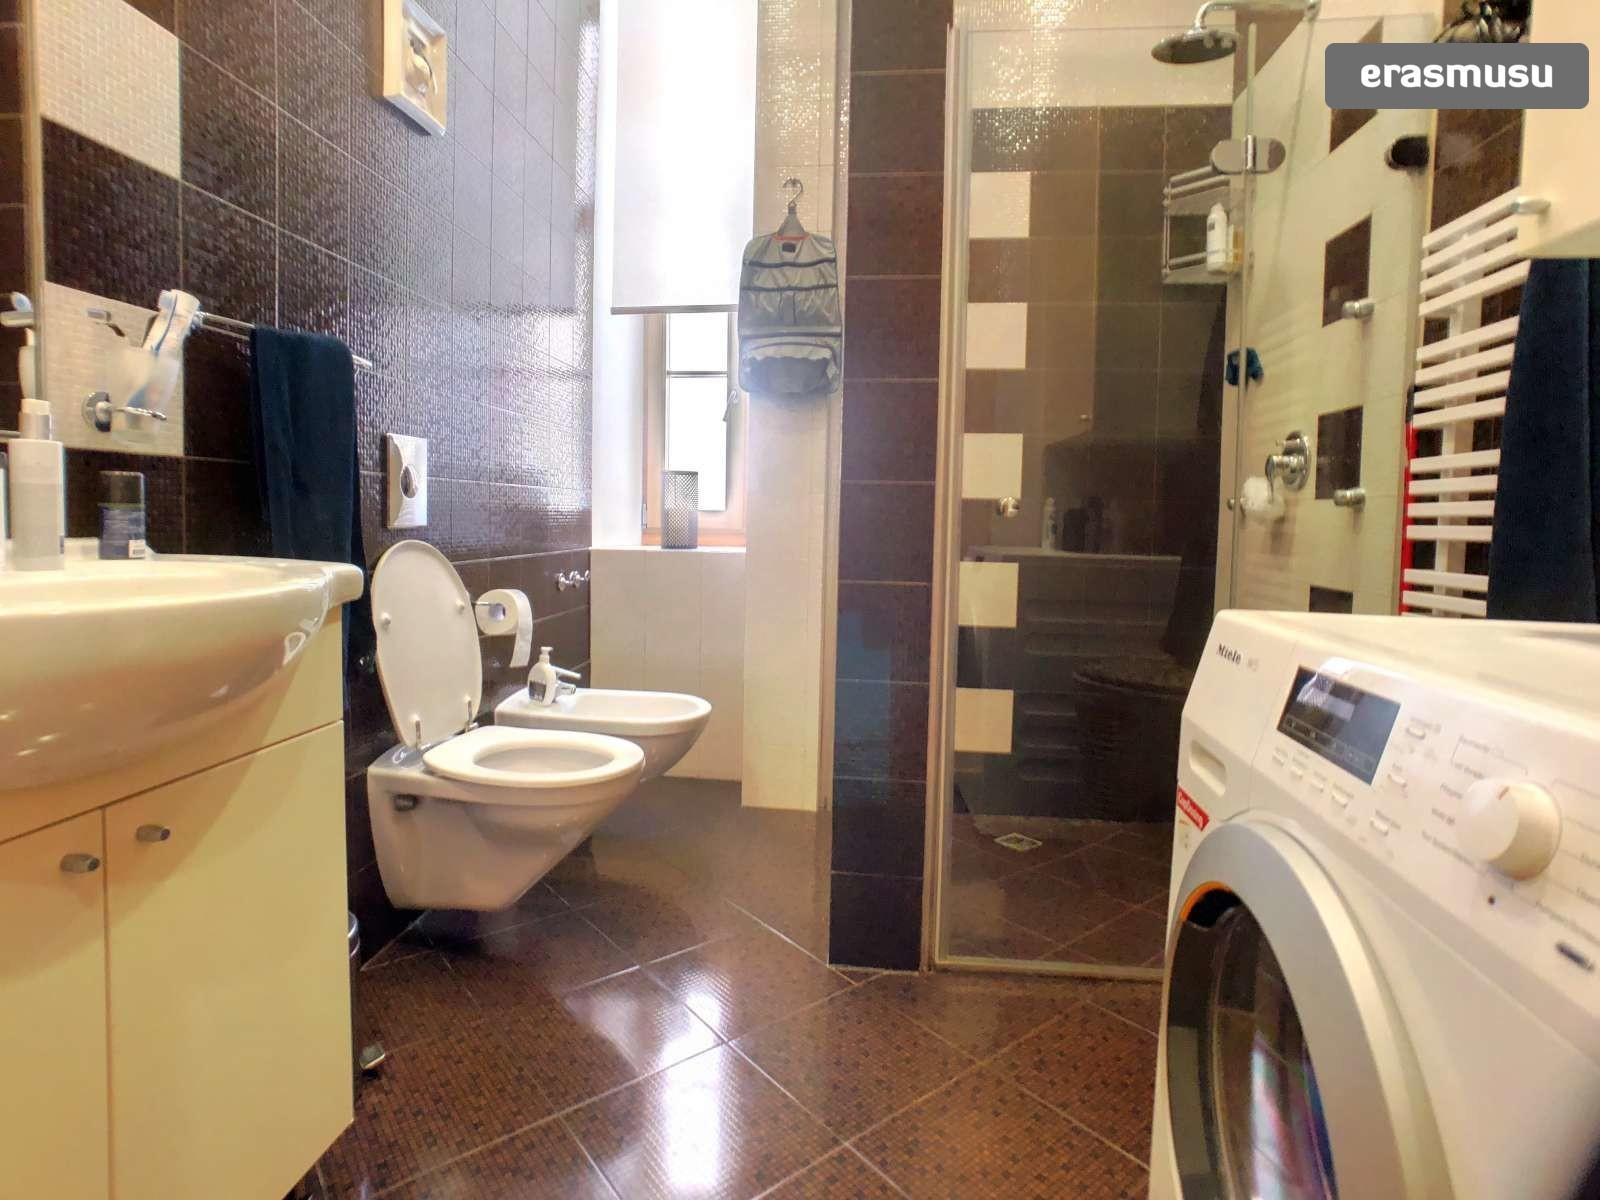 modern-1-bedroom-apartment-rent-centrs-7cda86413b74026fc9ff55920